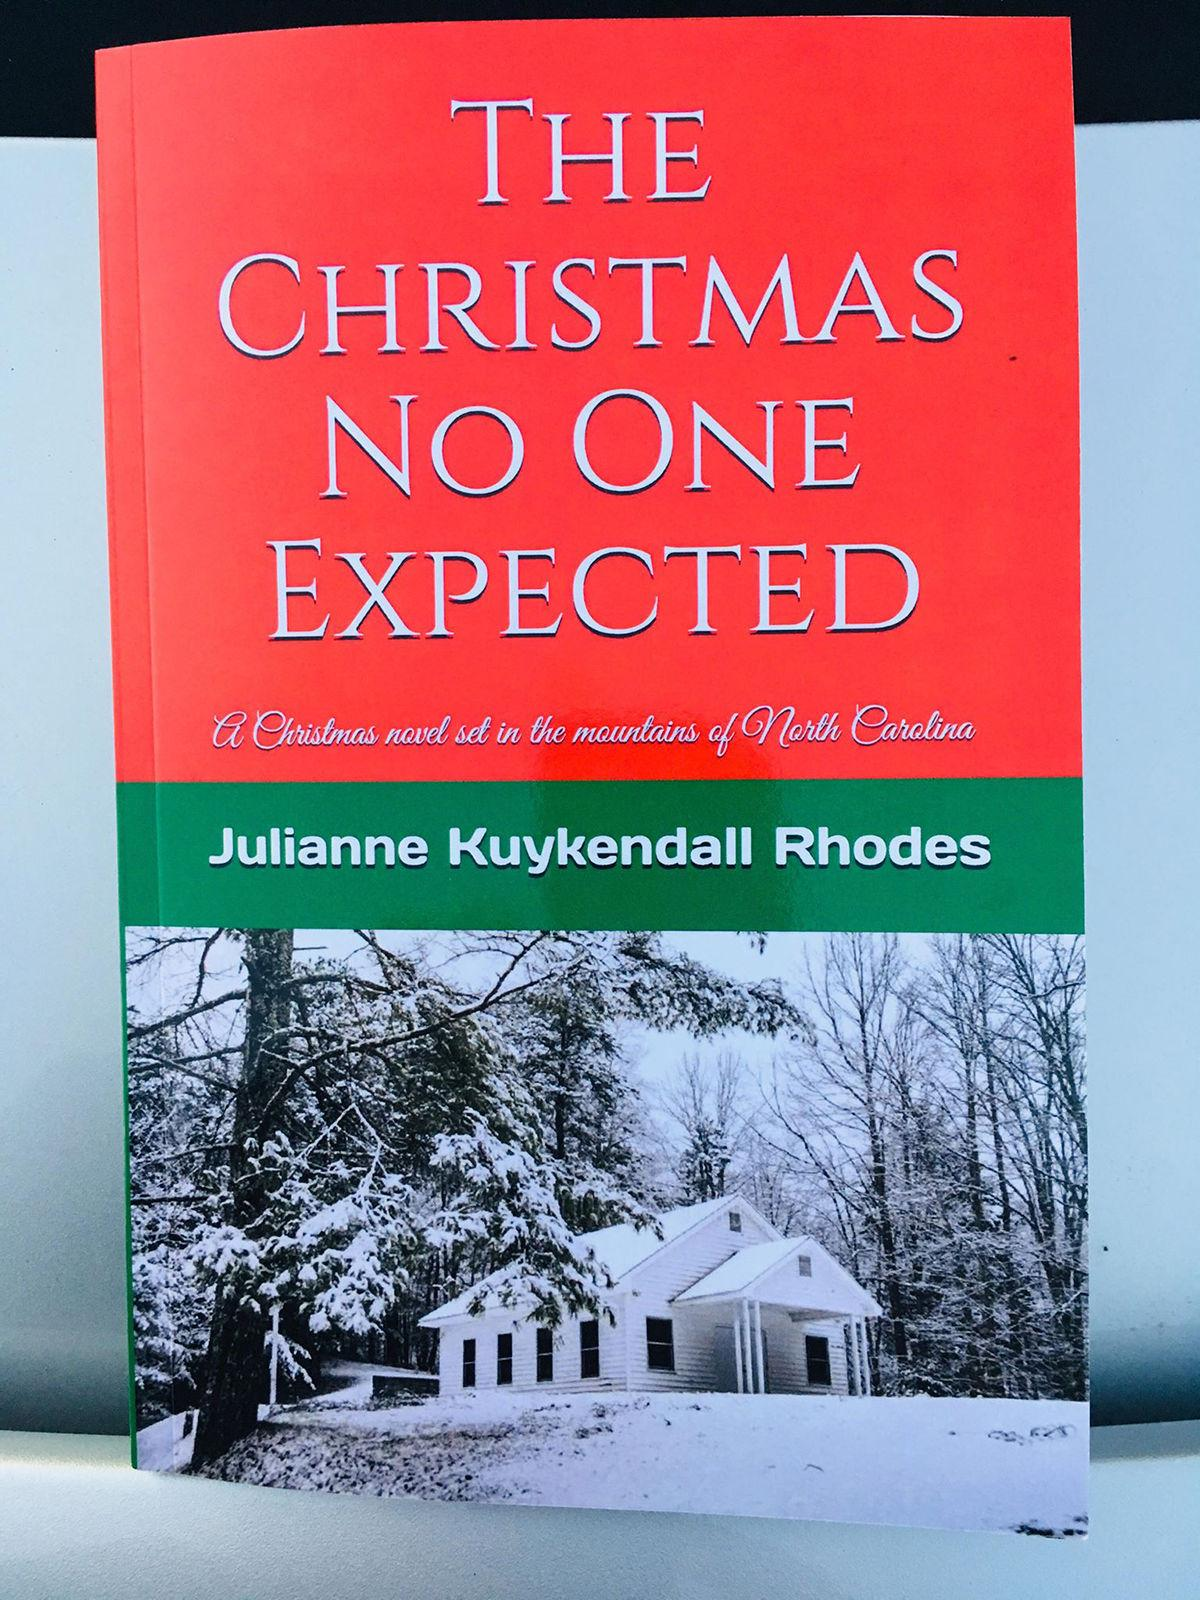 Julianne Kuykendall Rhodes Book Cover